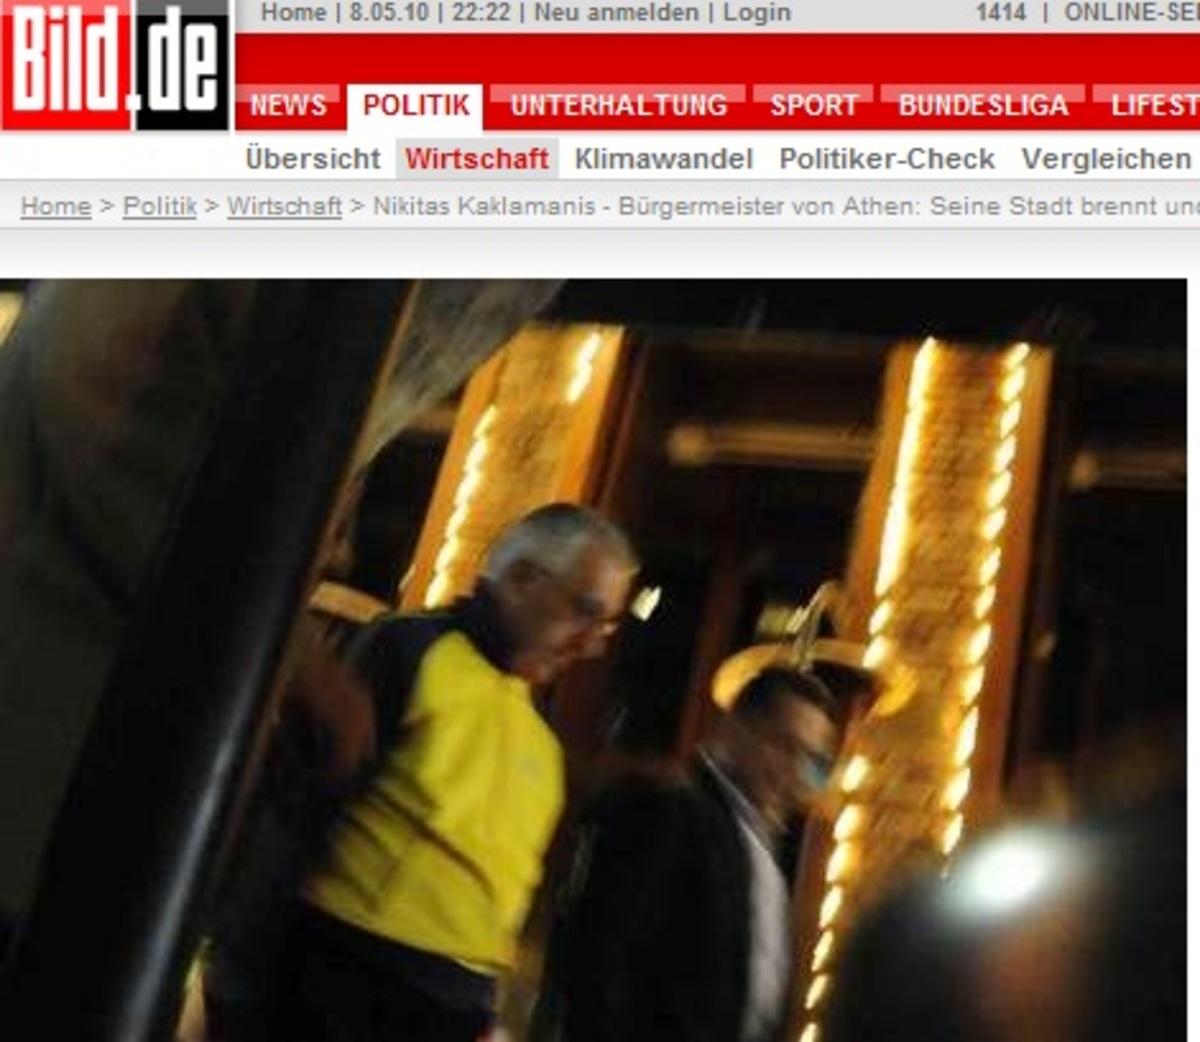 Bild: Ενώ η Αθήνα καιγόταν ο Κακλαμάνης έτρωγε στο Κολωνάκι | Newsit.gr